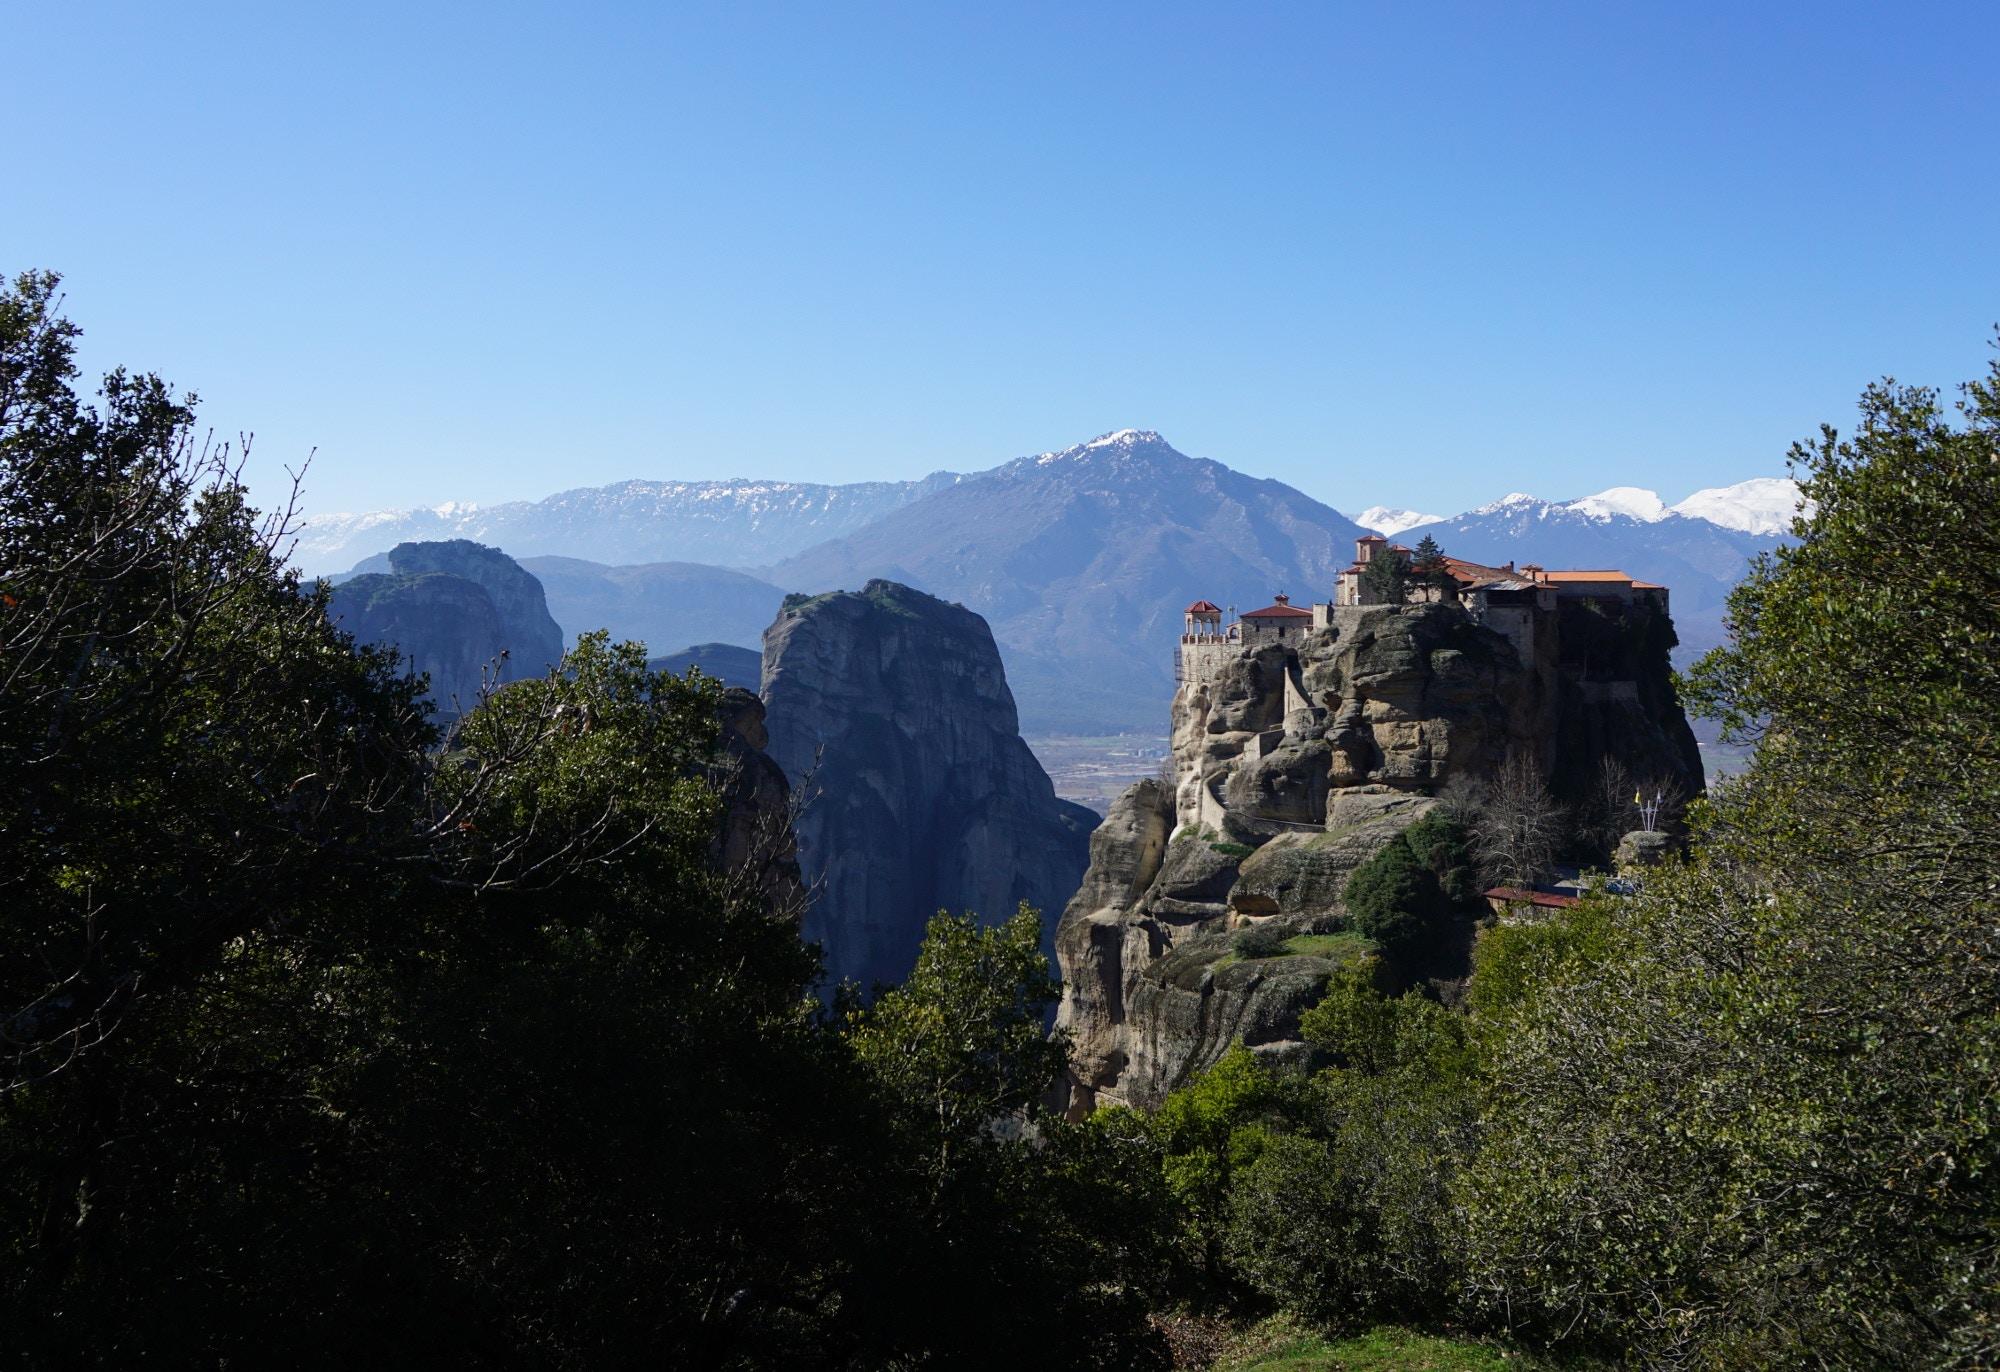 Spain, Cambodia, Greece & Australia – Lonely Planet's travel blog